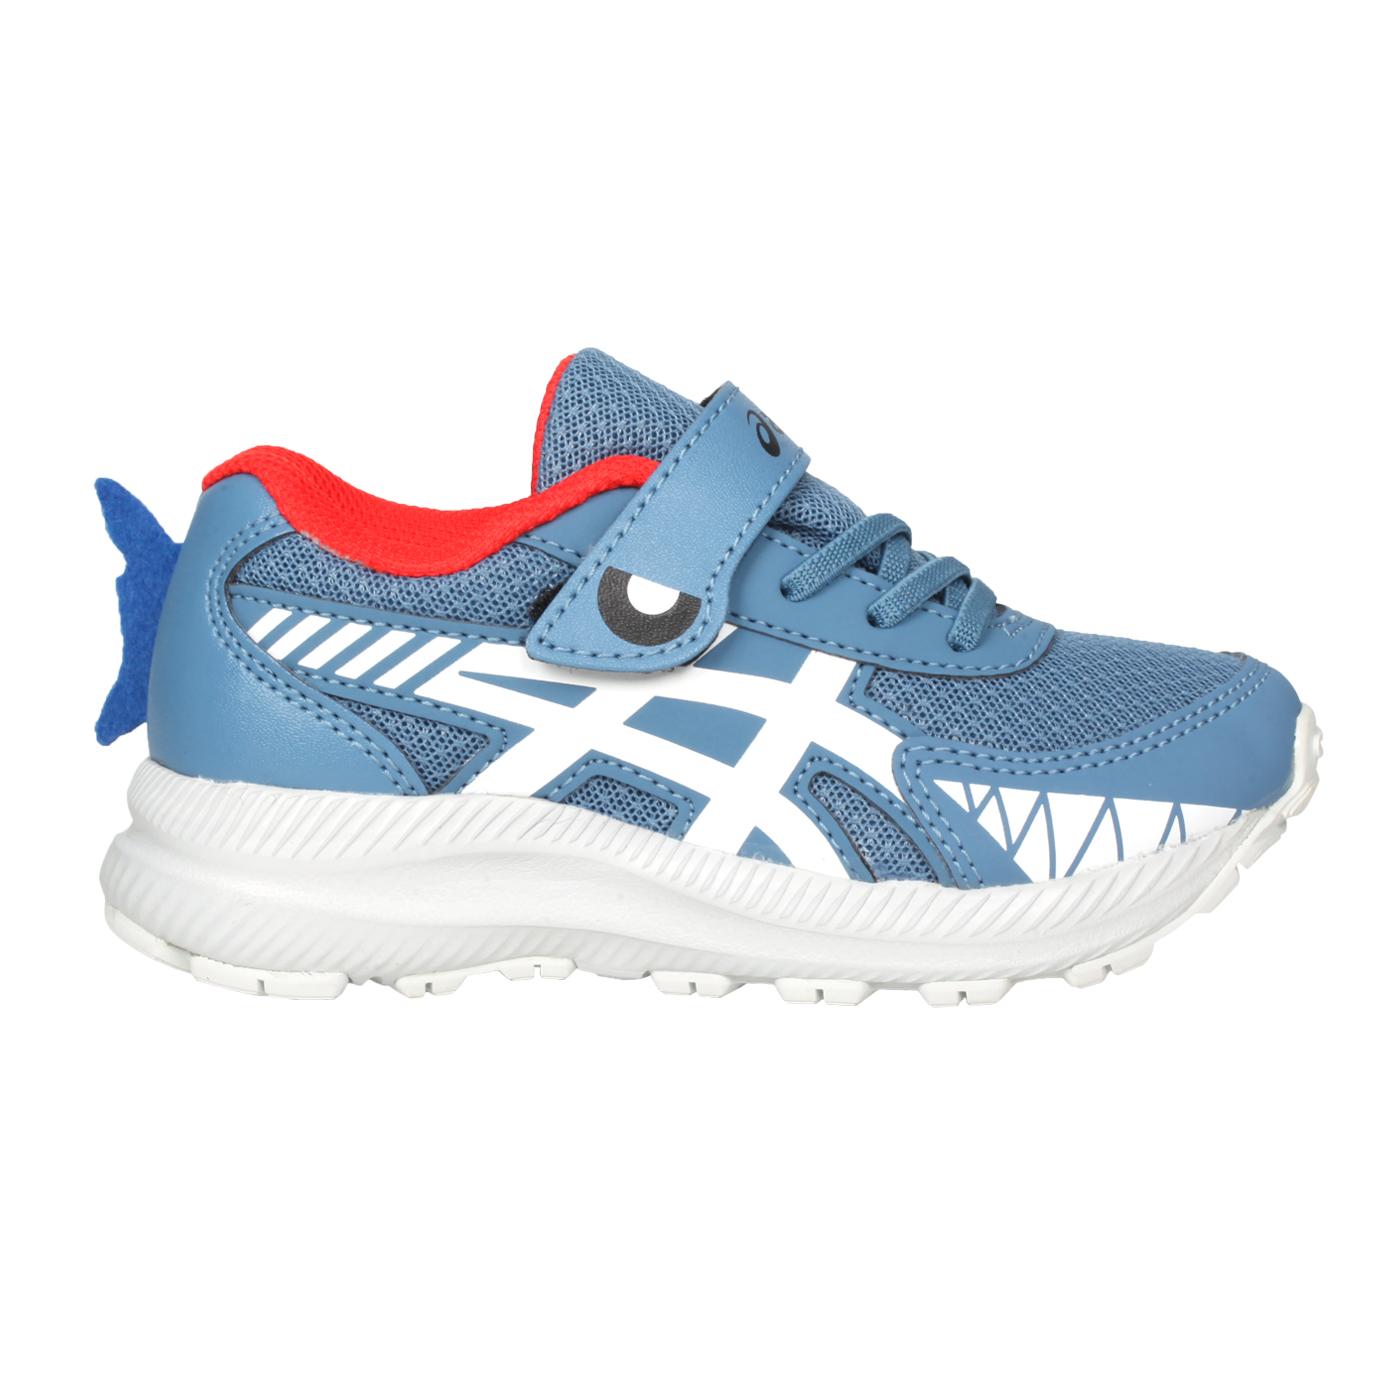 ASICS 中童慢跑鞋  @CONTEND 7 PS SCHOOL YARD@1014A208-404 - 藍白橘